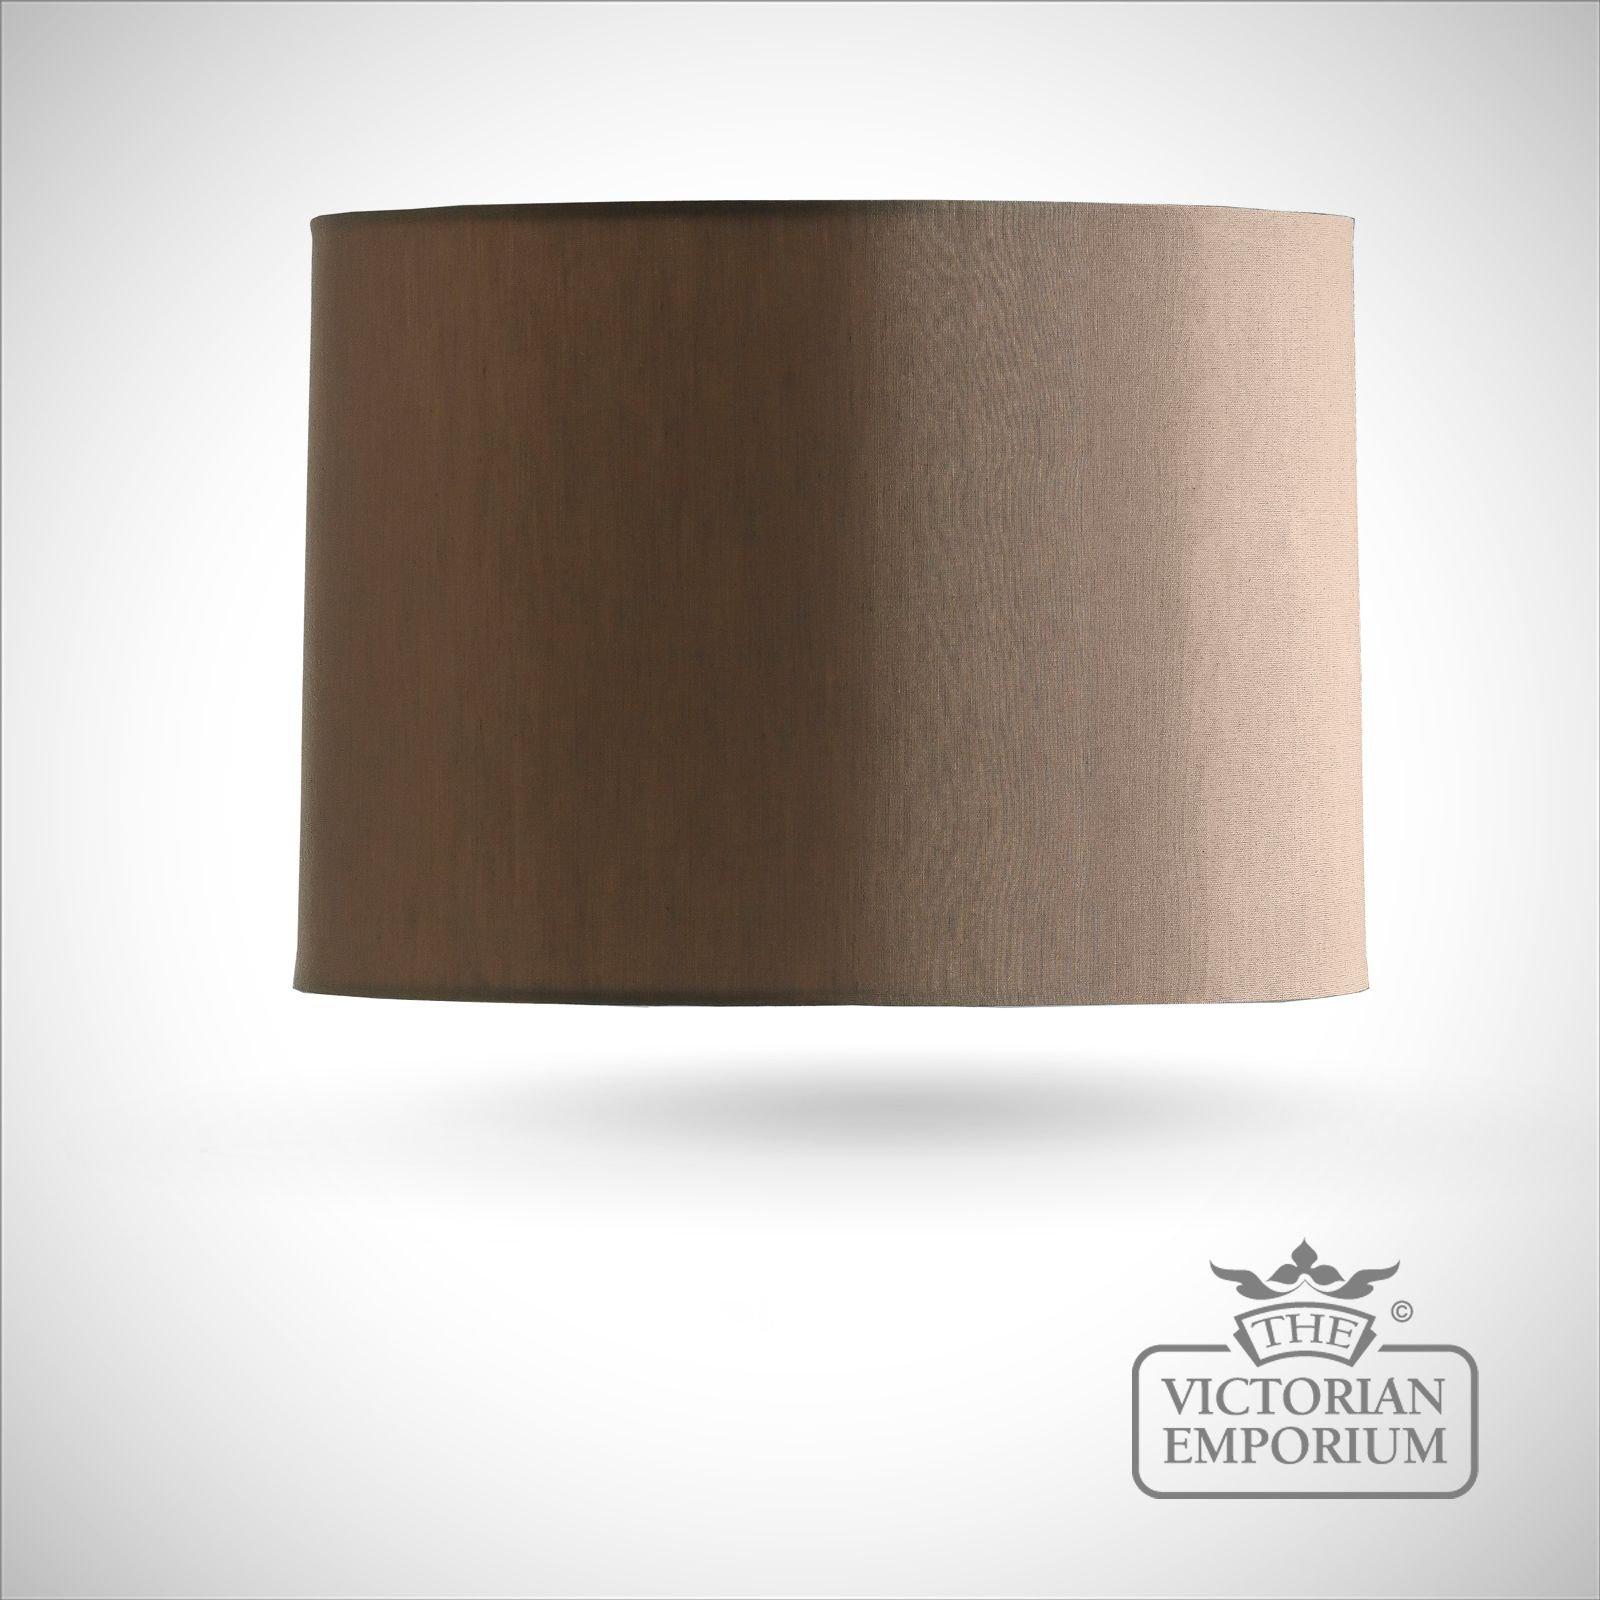 Bronze cylinder lamp shade 36cm lamp shades bronze cylinder lamp shade 36cm mozeypictures Images